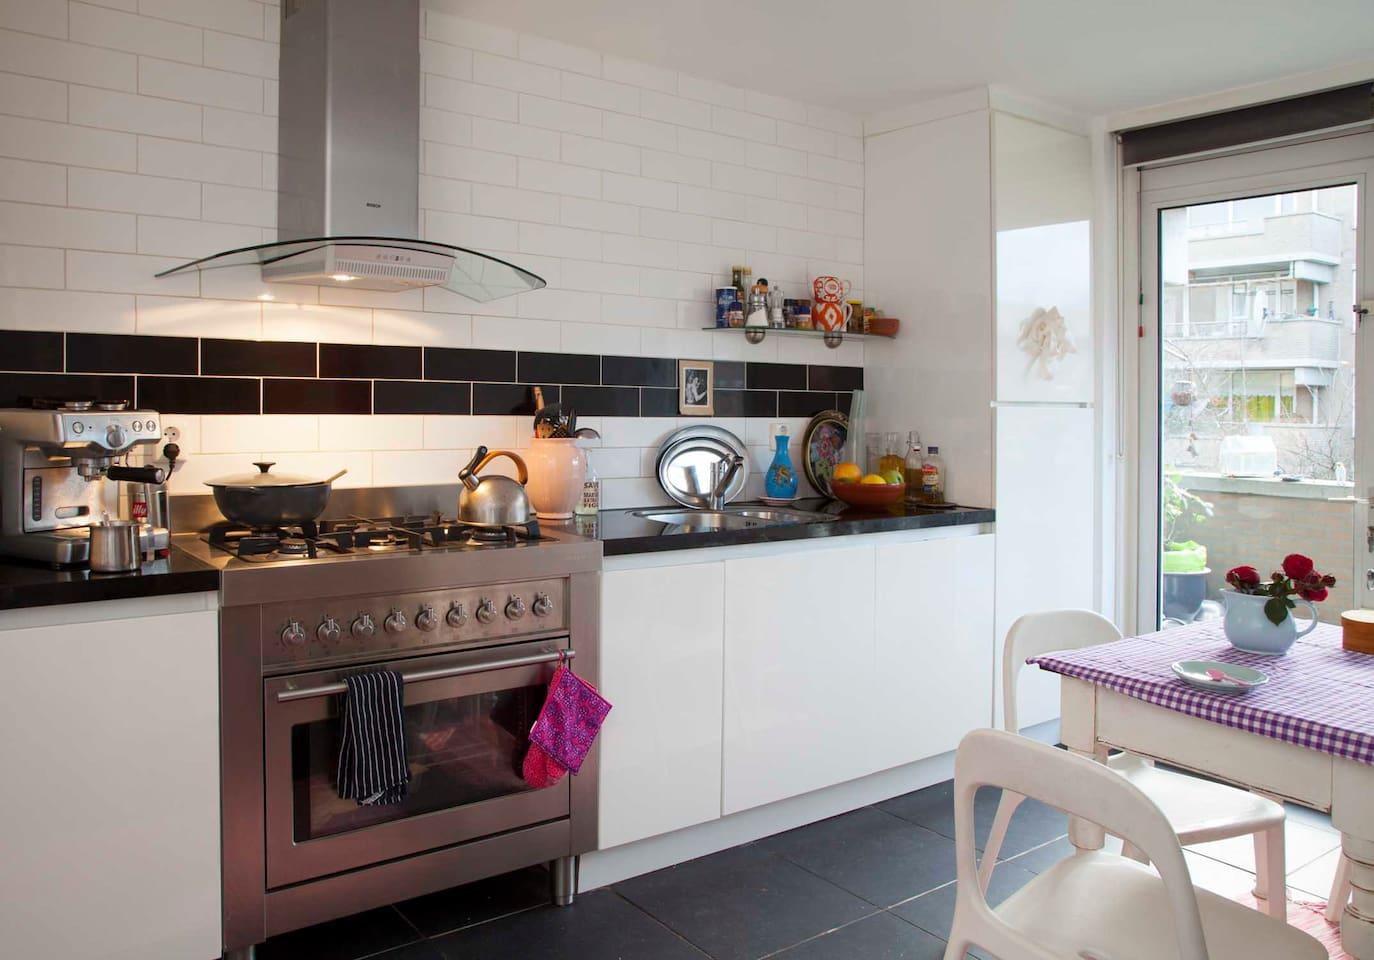 Spacious kitchen with espresso machine, dishwasher, fridge, etc- opens to a small balcony.